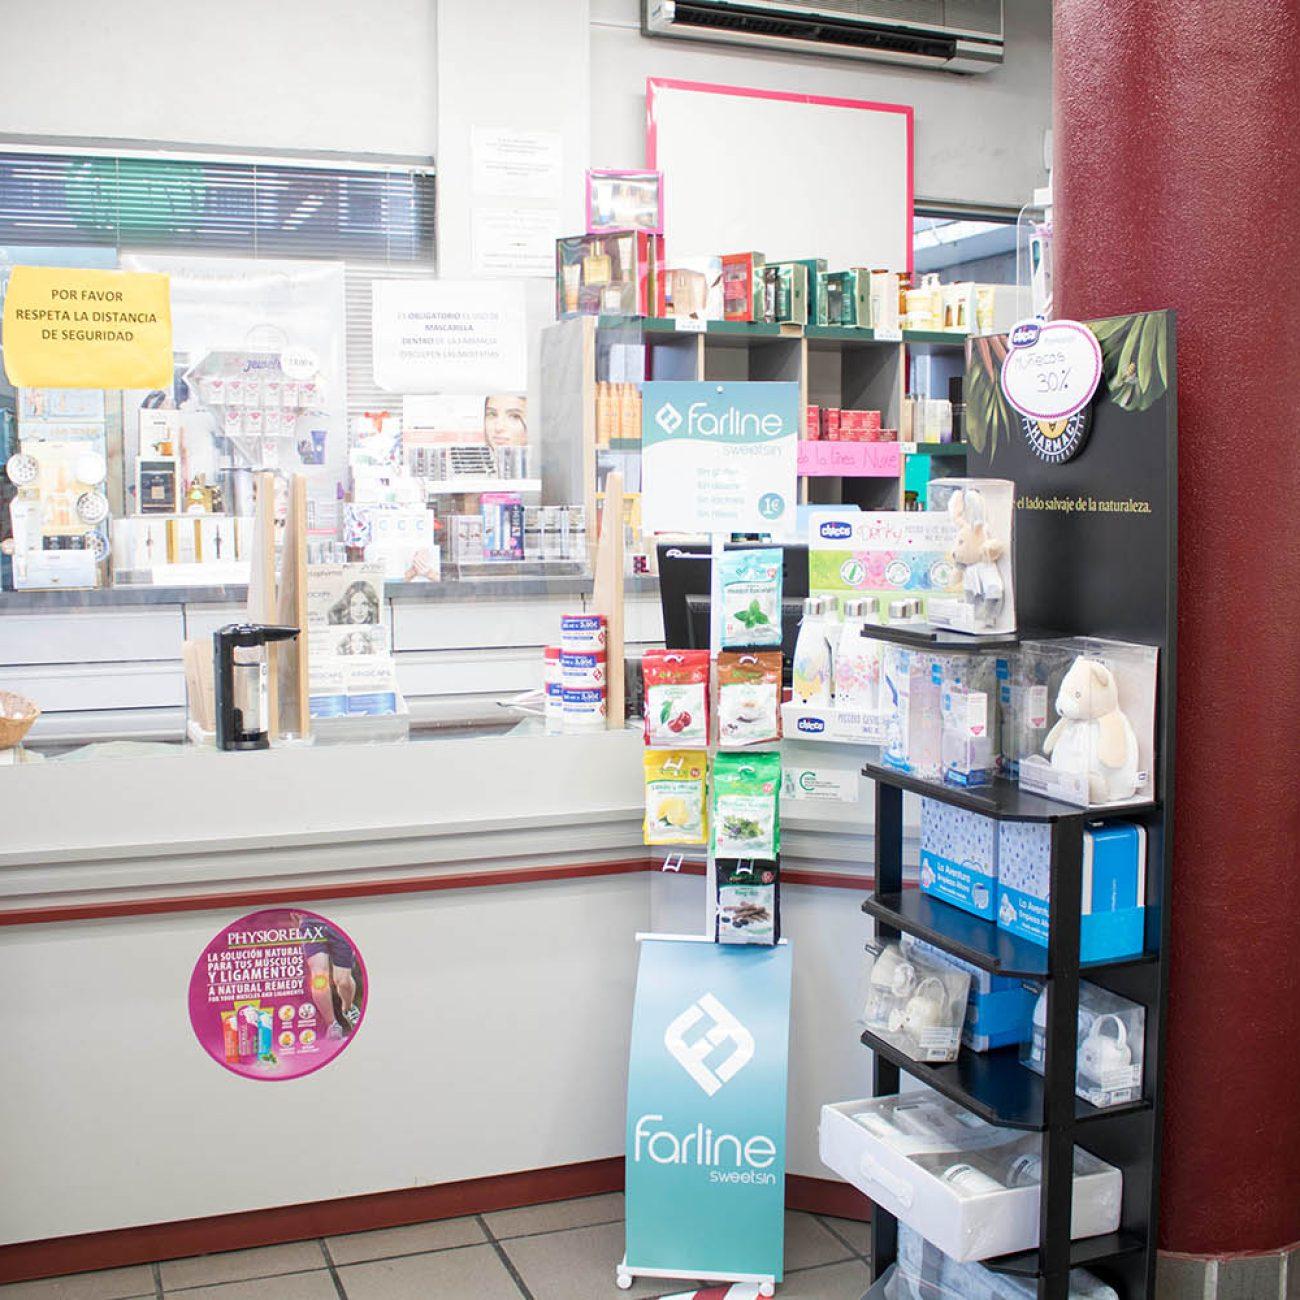 Farmacia Olatz Vergniory en Deusto